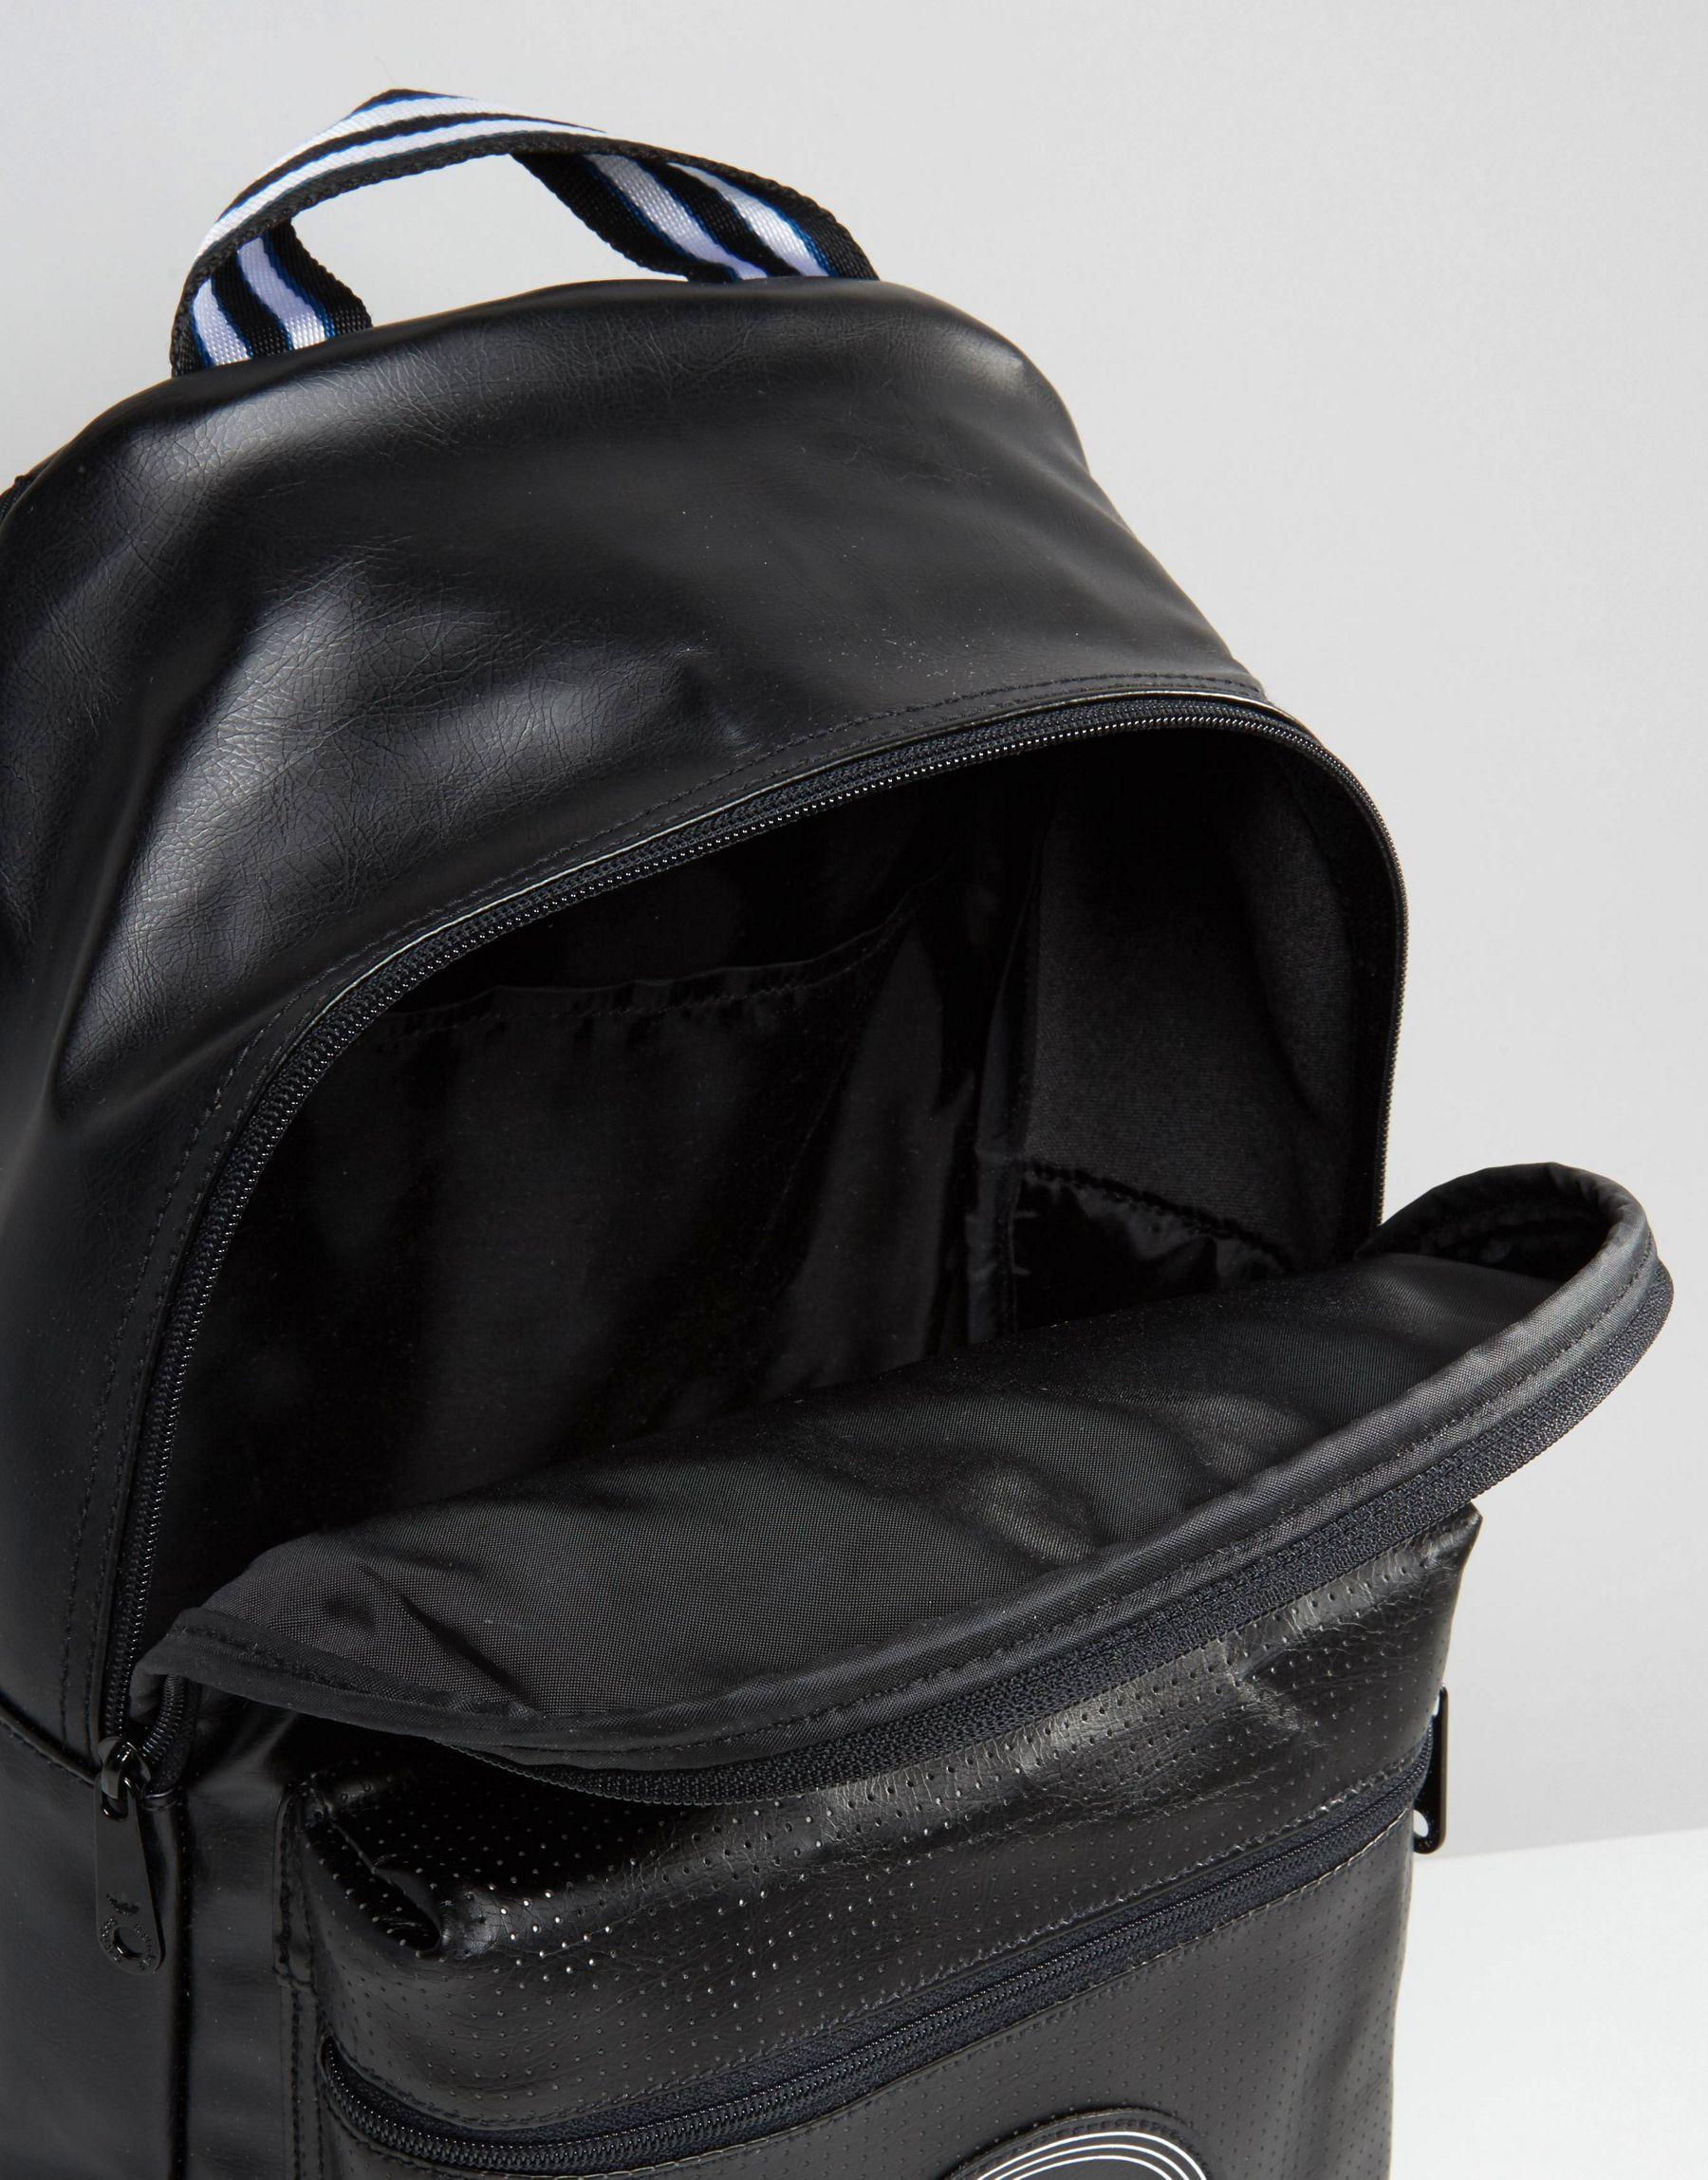 6bcb960df534 Lyst - adidas Originals Perforated Backpack In Black Ay7744 in Black ...